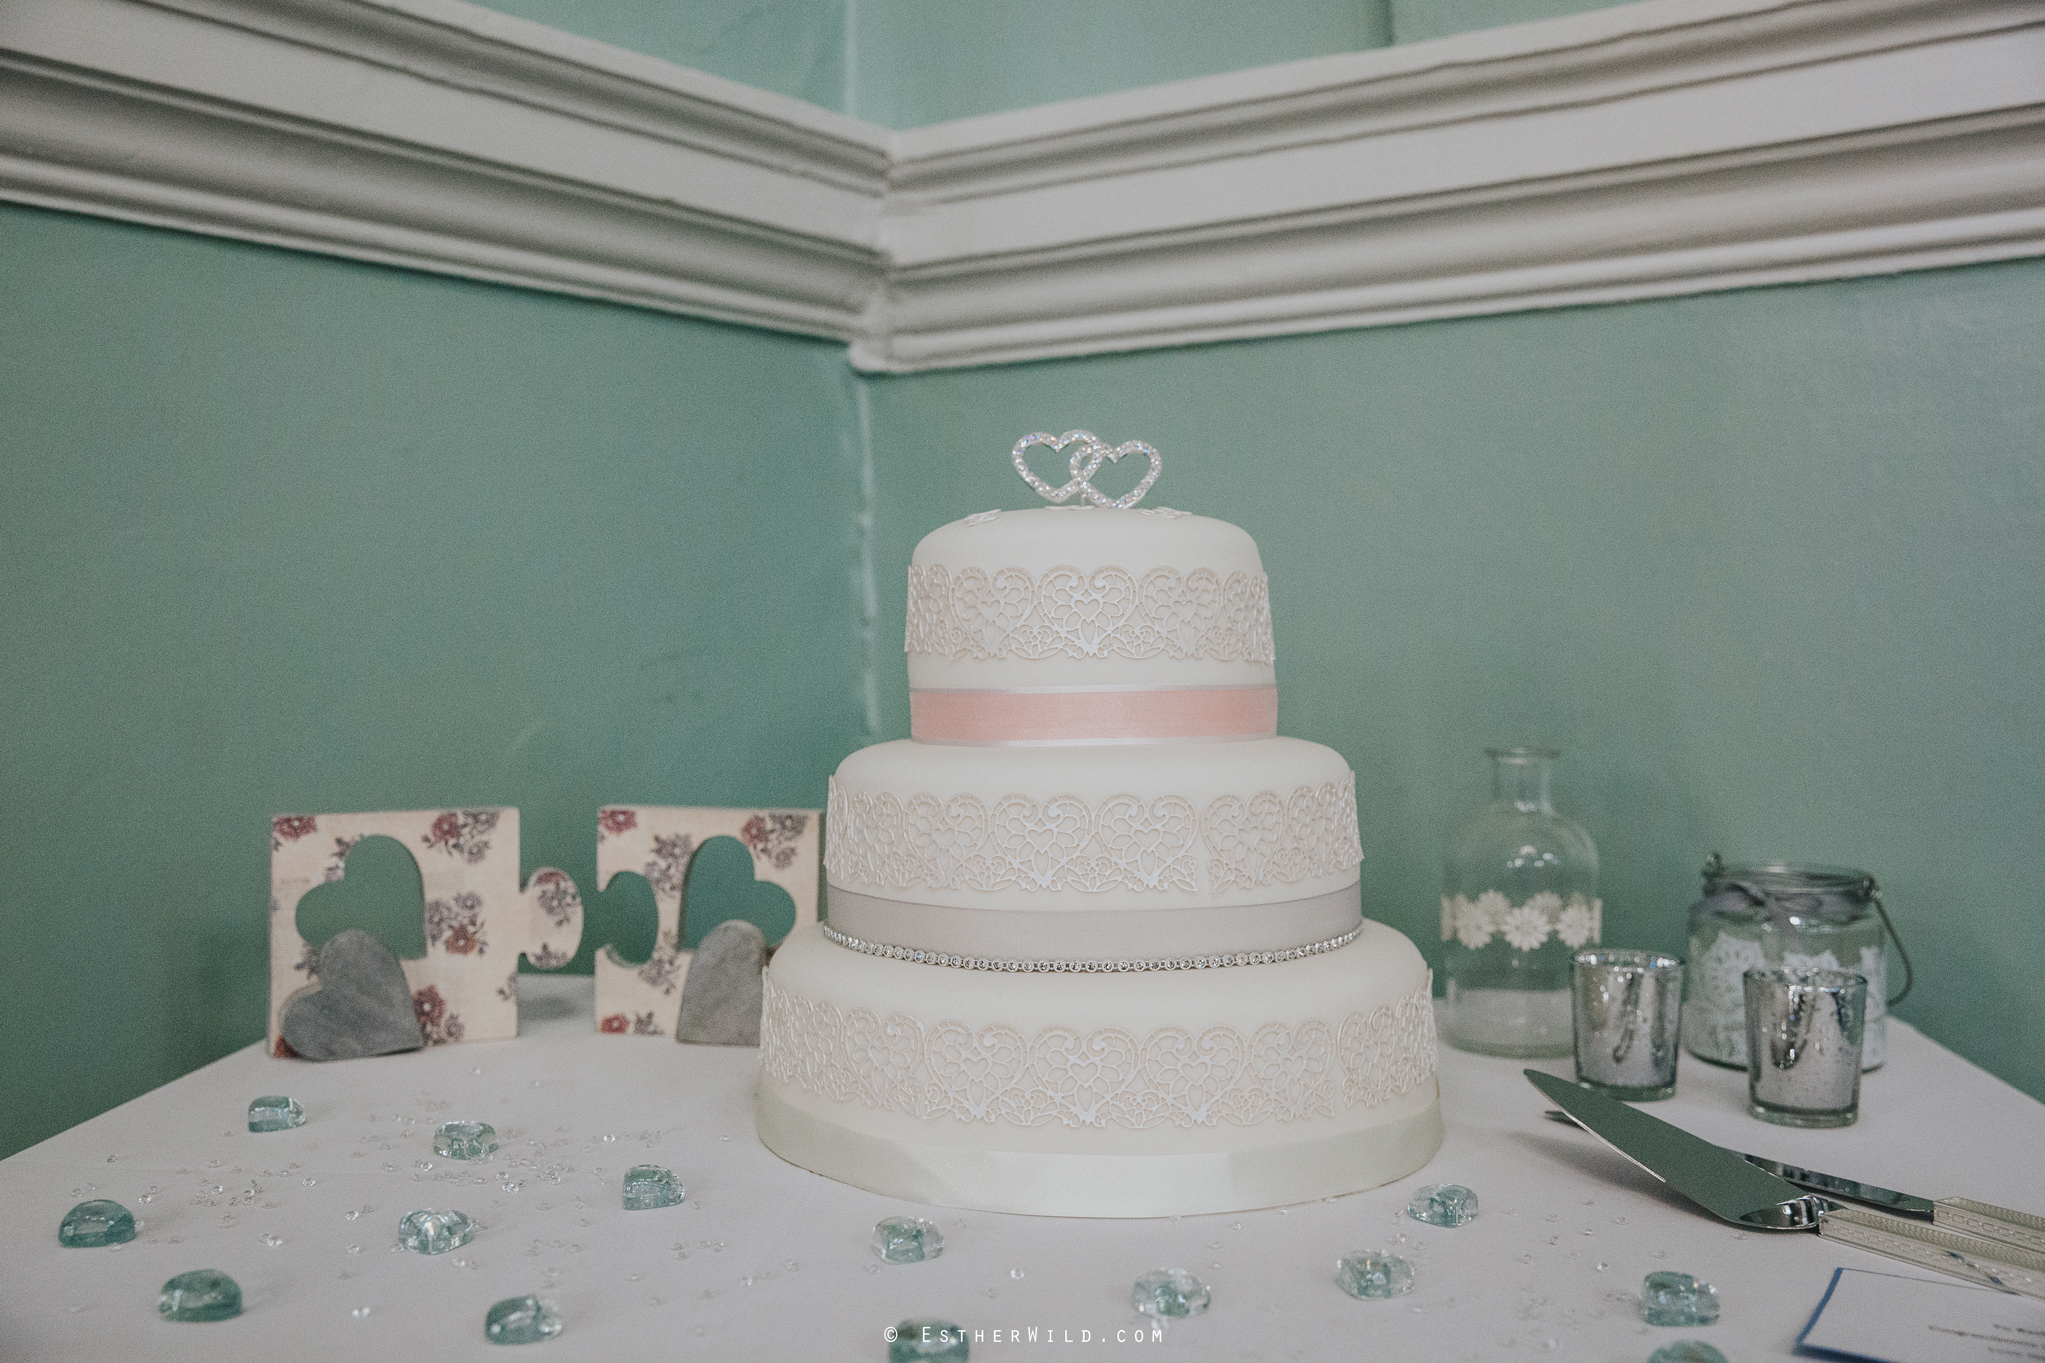 Wedding_Kings_Lynn_Town_Hall_Norfolk_Photographer_Esther_Wild_IMG_1418.jpg